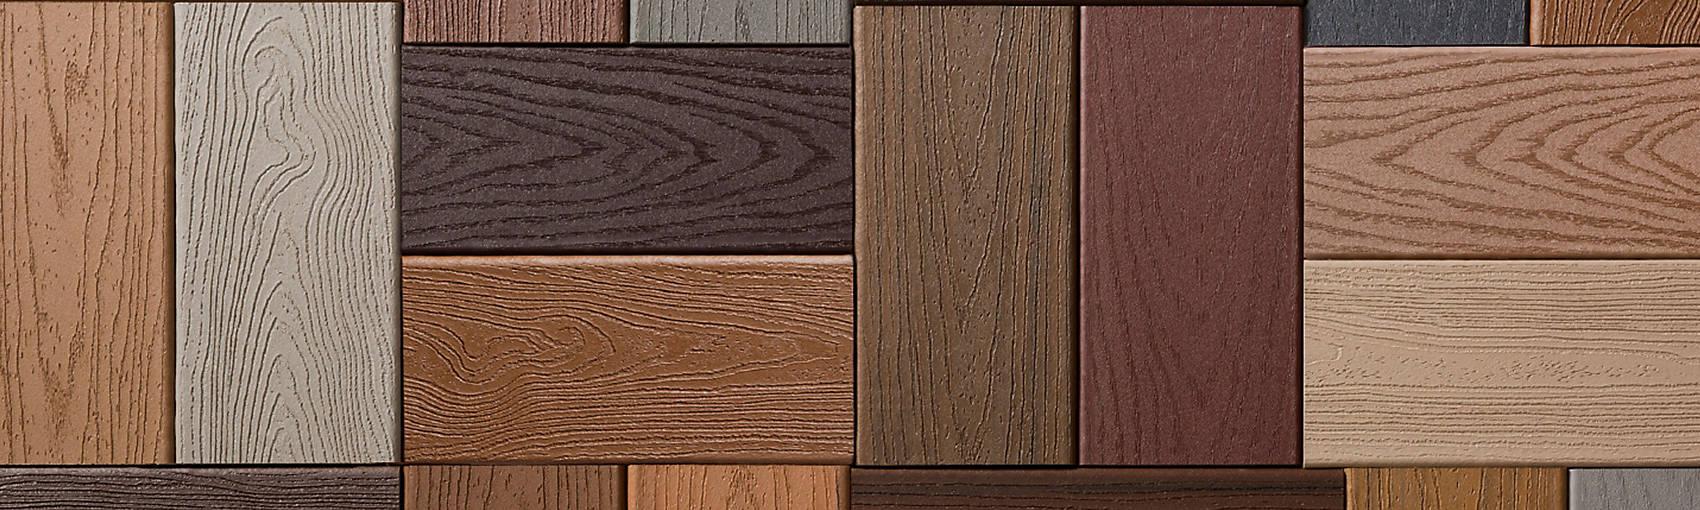 Delightful Composite Decking | Composite Deck Materials | Trex